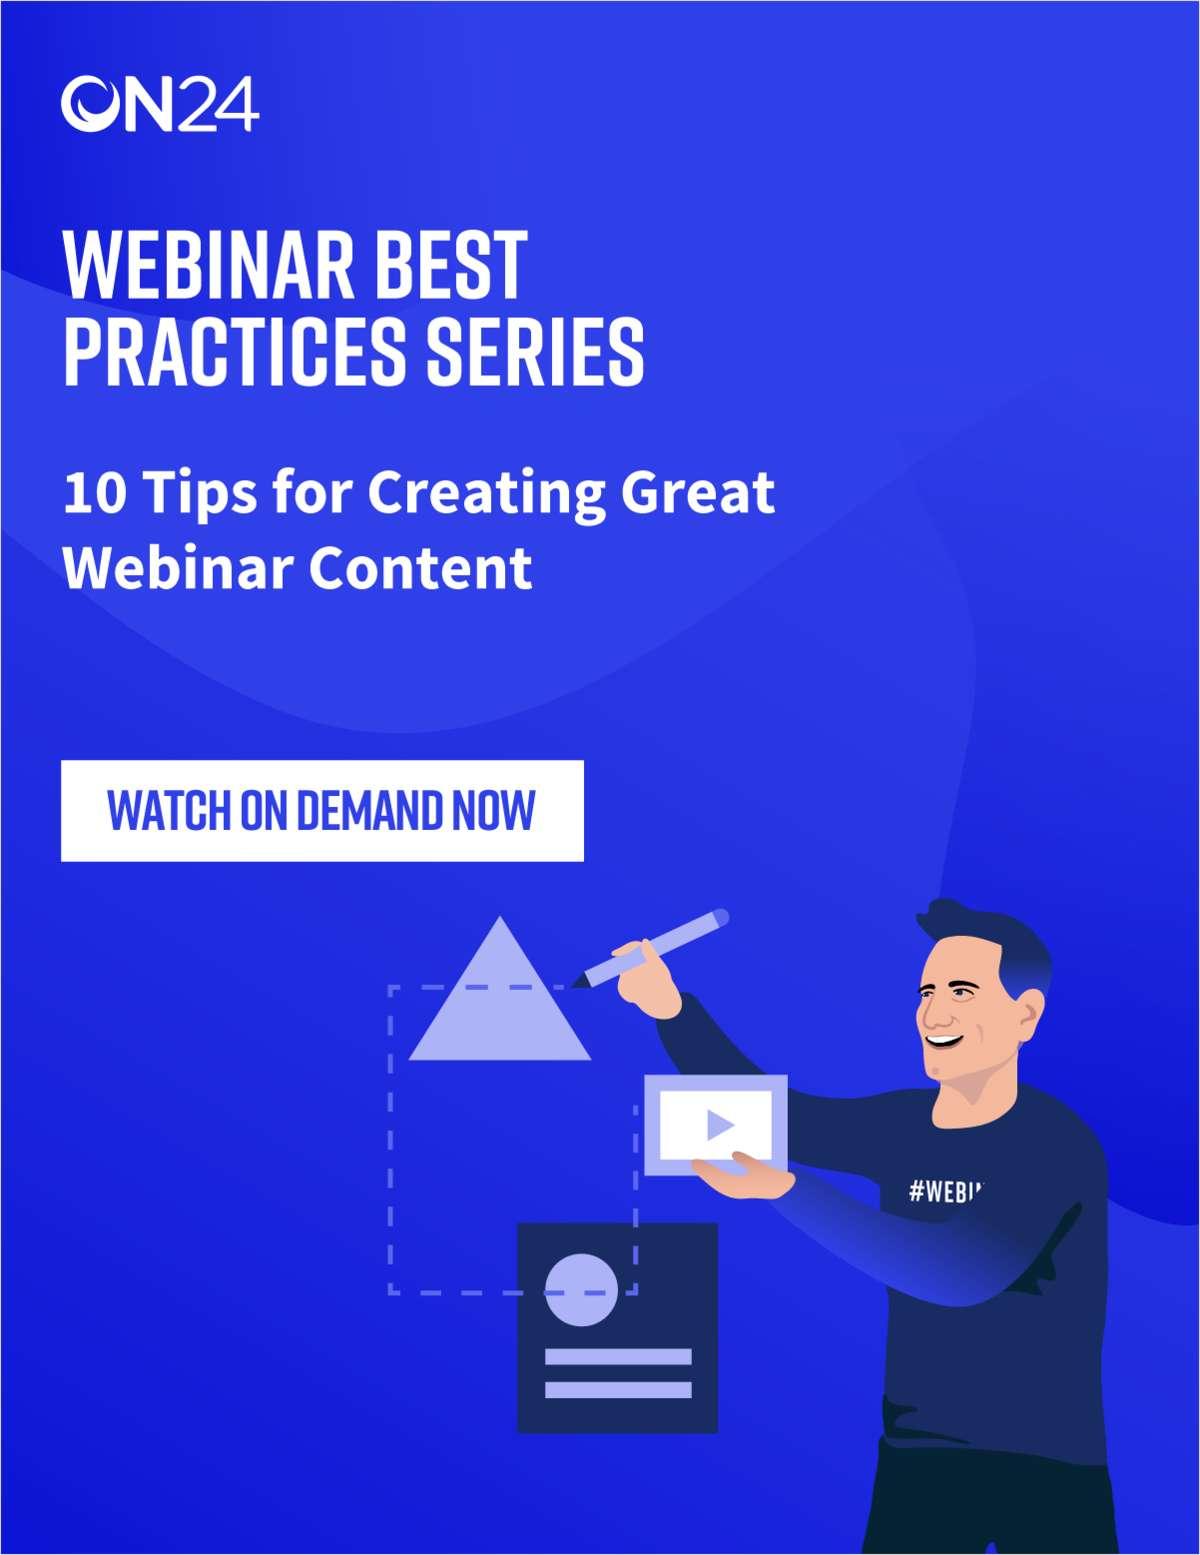 Webinar Best Practices Series: 10 Tips for Creating Great Webinar Content